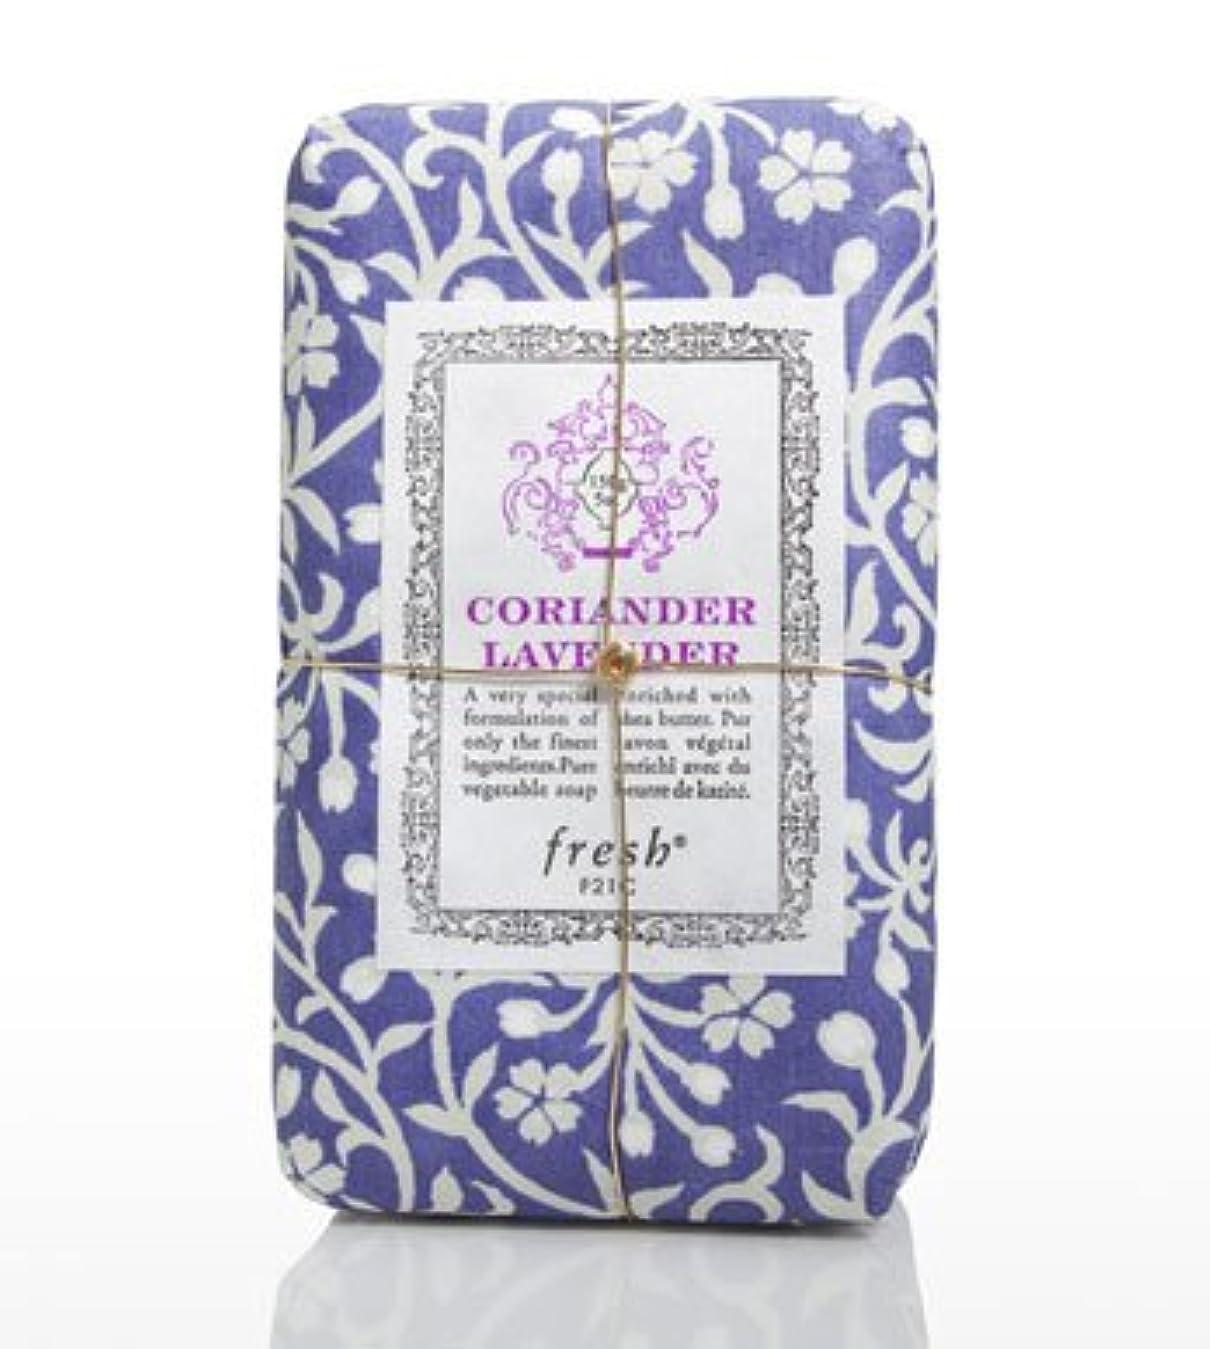 Fresh CORIANDER LAVENDAR SOAP(フレッシュ コリアンダーラベンダー ソープ) 5.0 oz (150gl) 石鹸 by Fresh